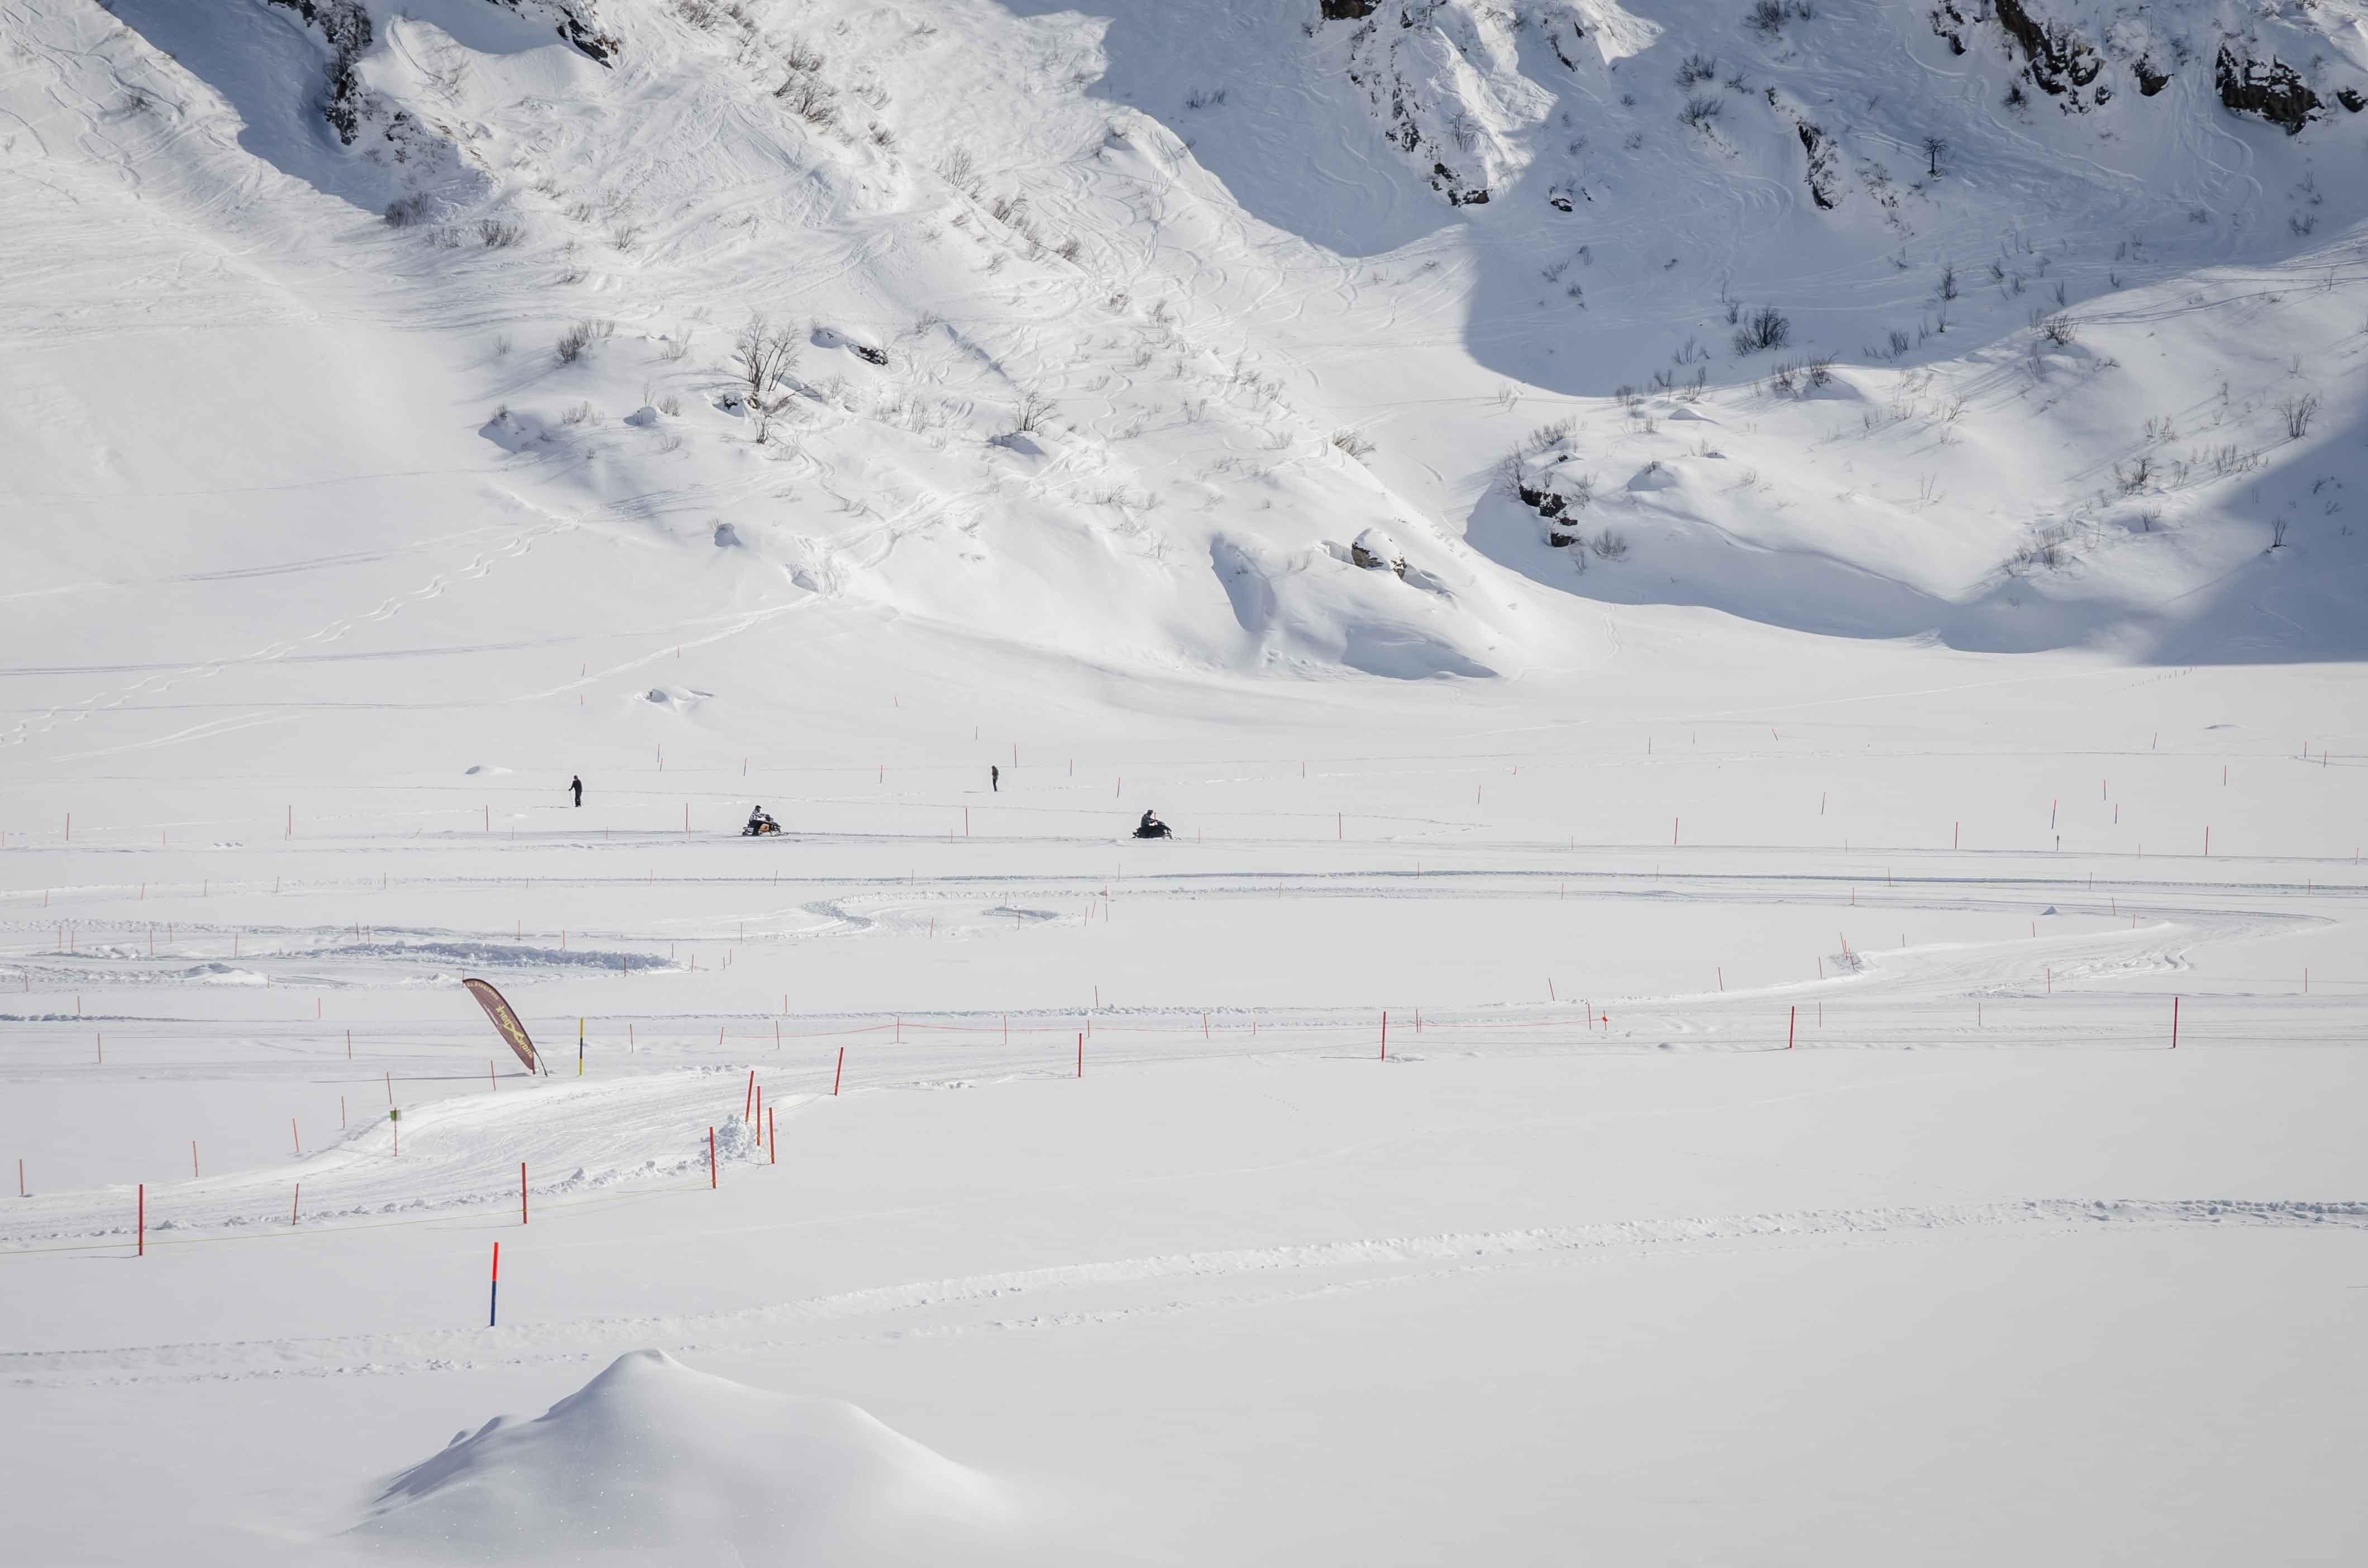 snowxpark engelberg